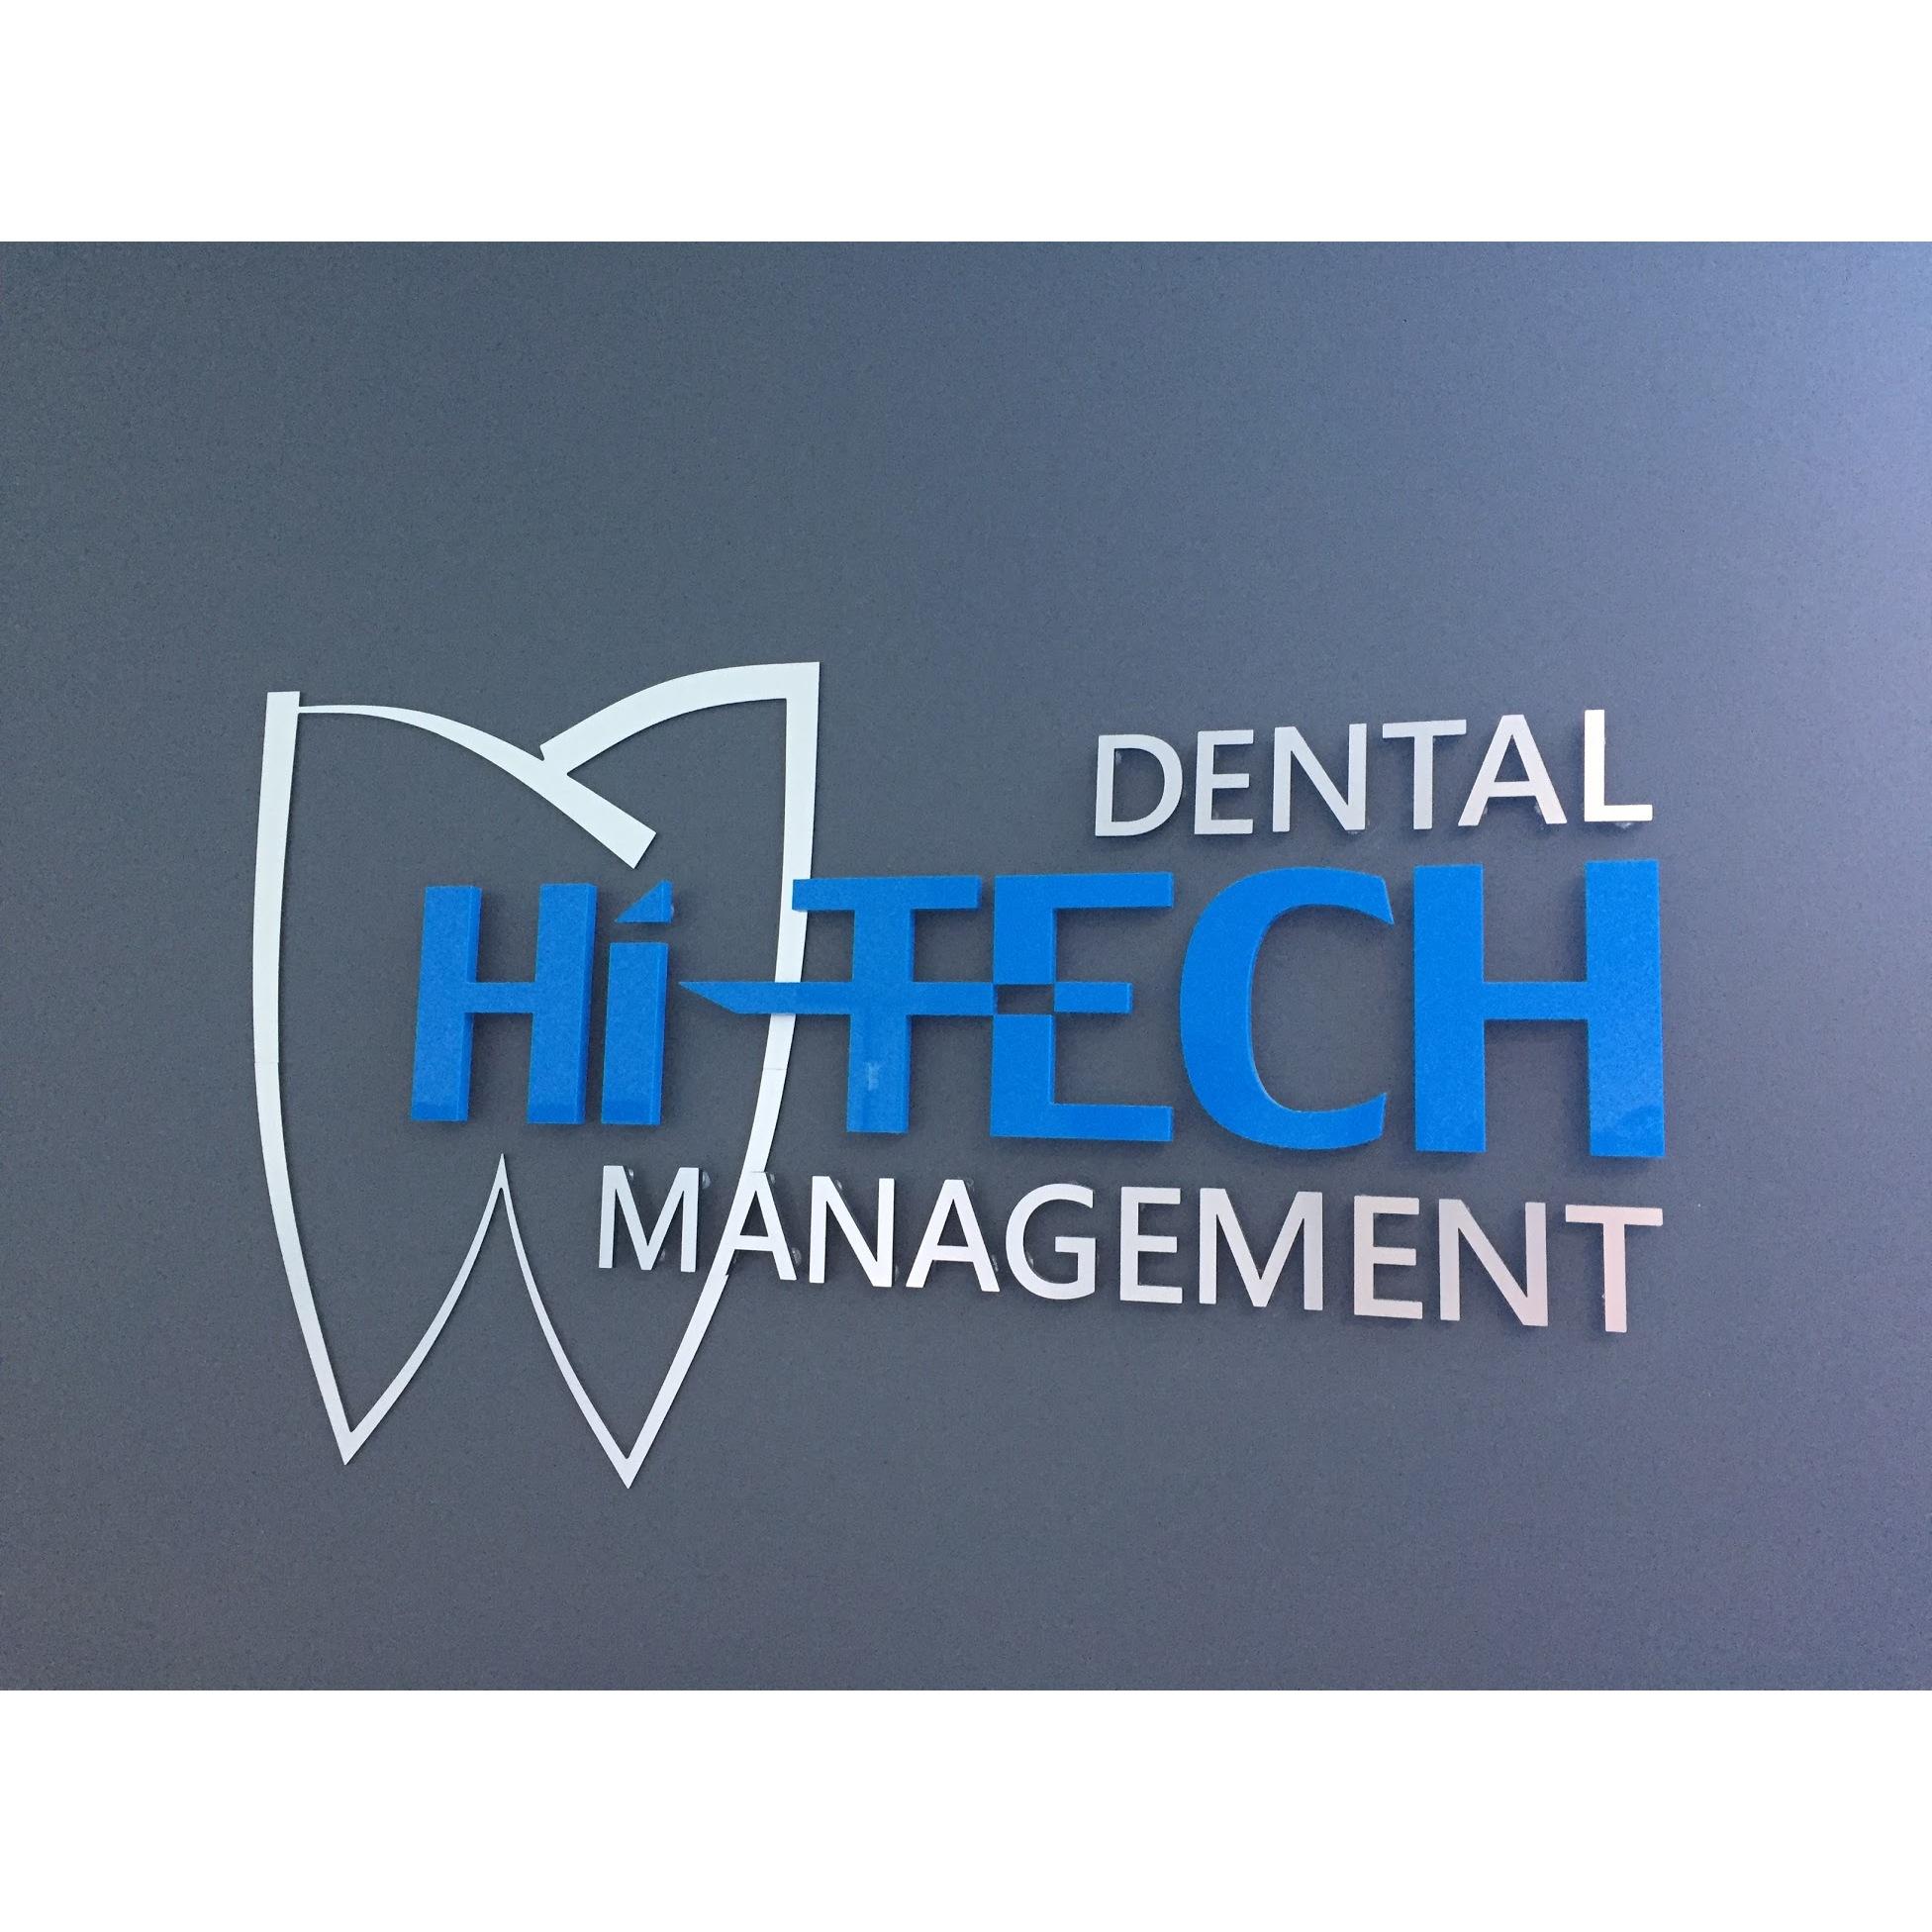 Dental Hi-Tech Management